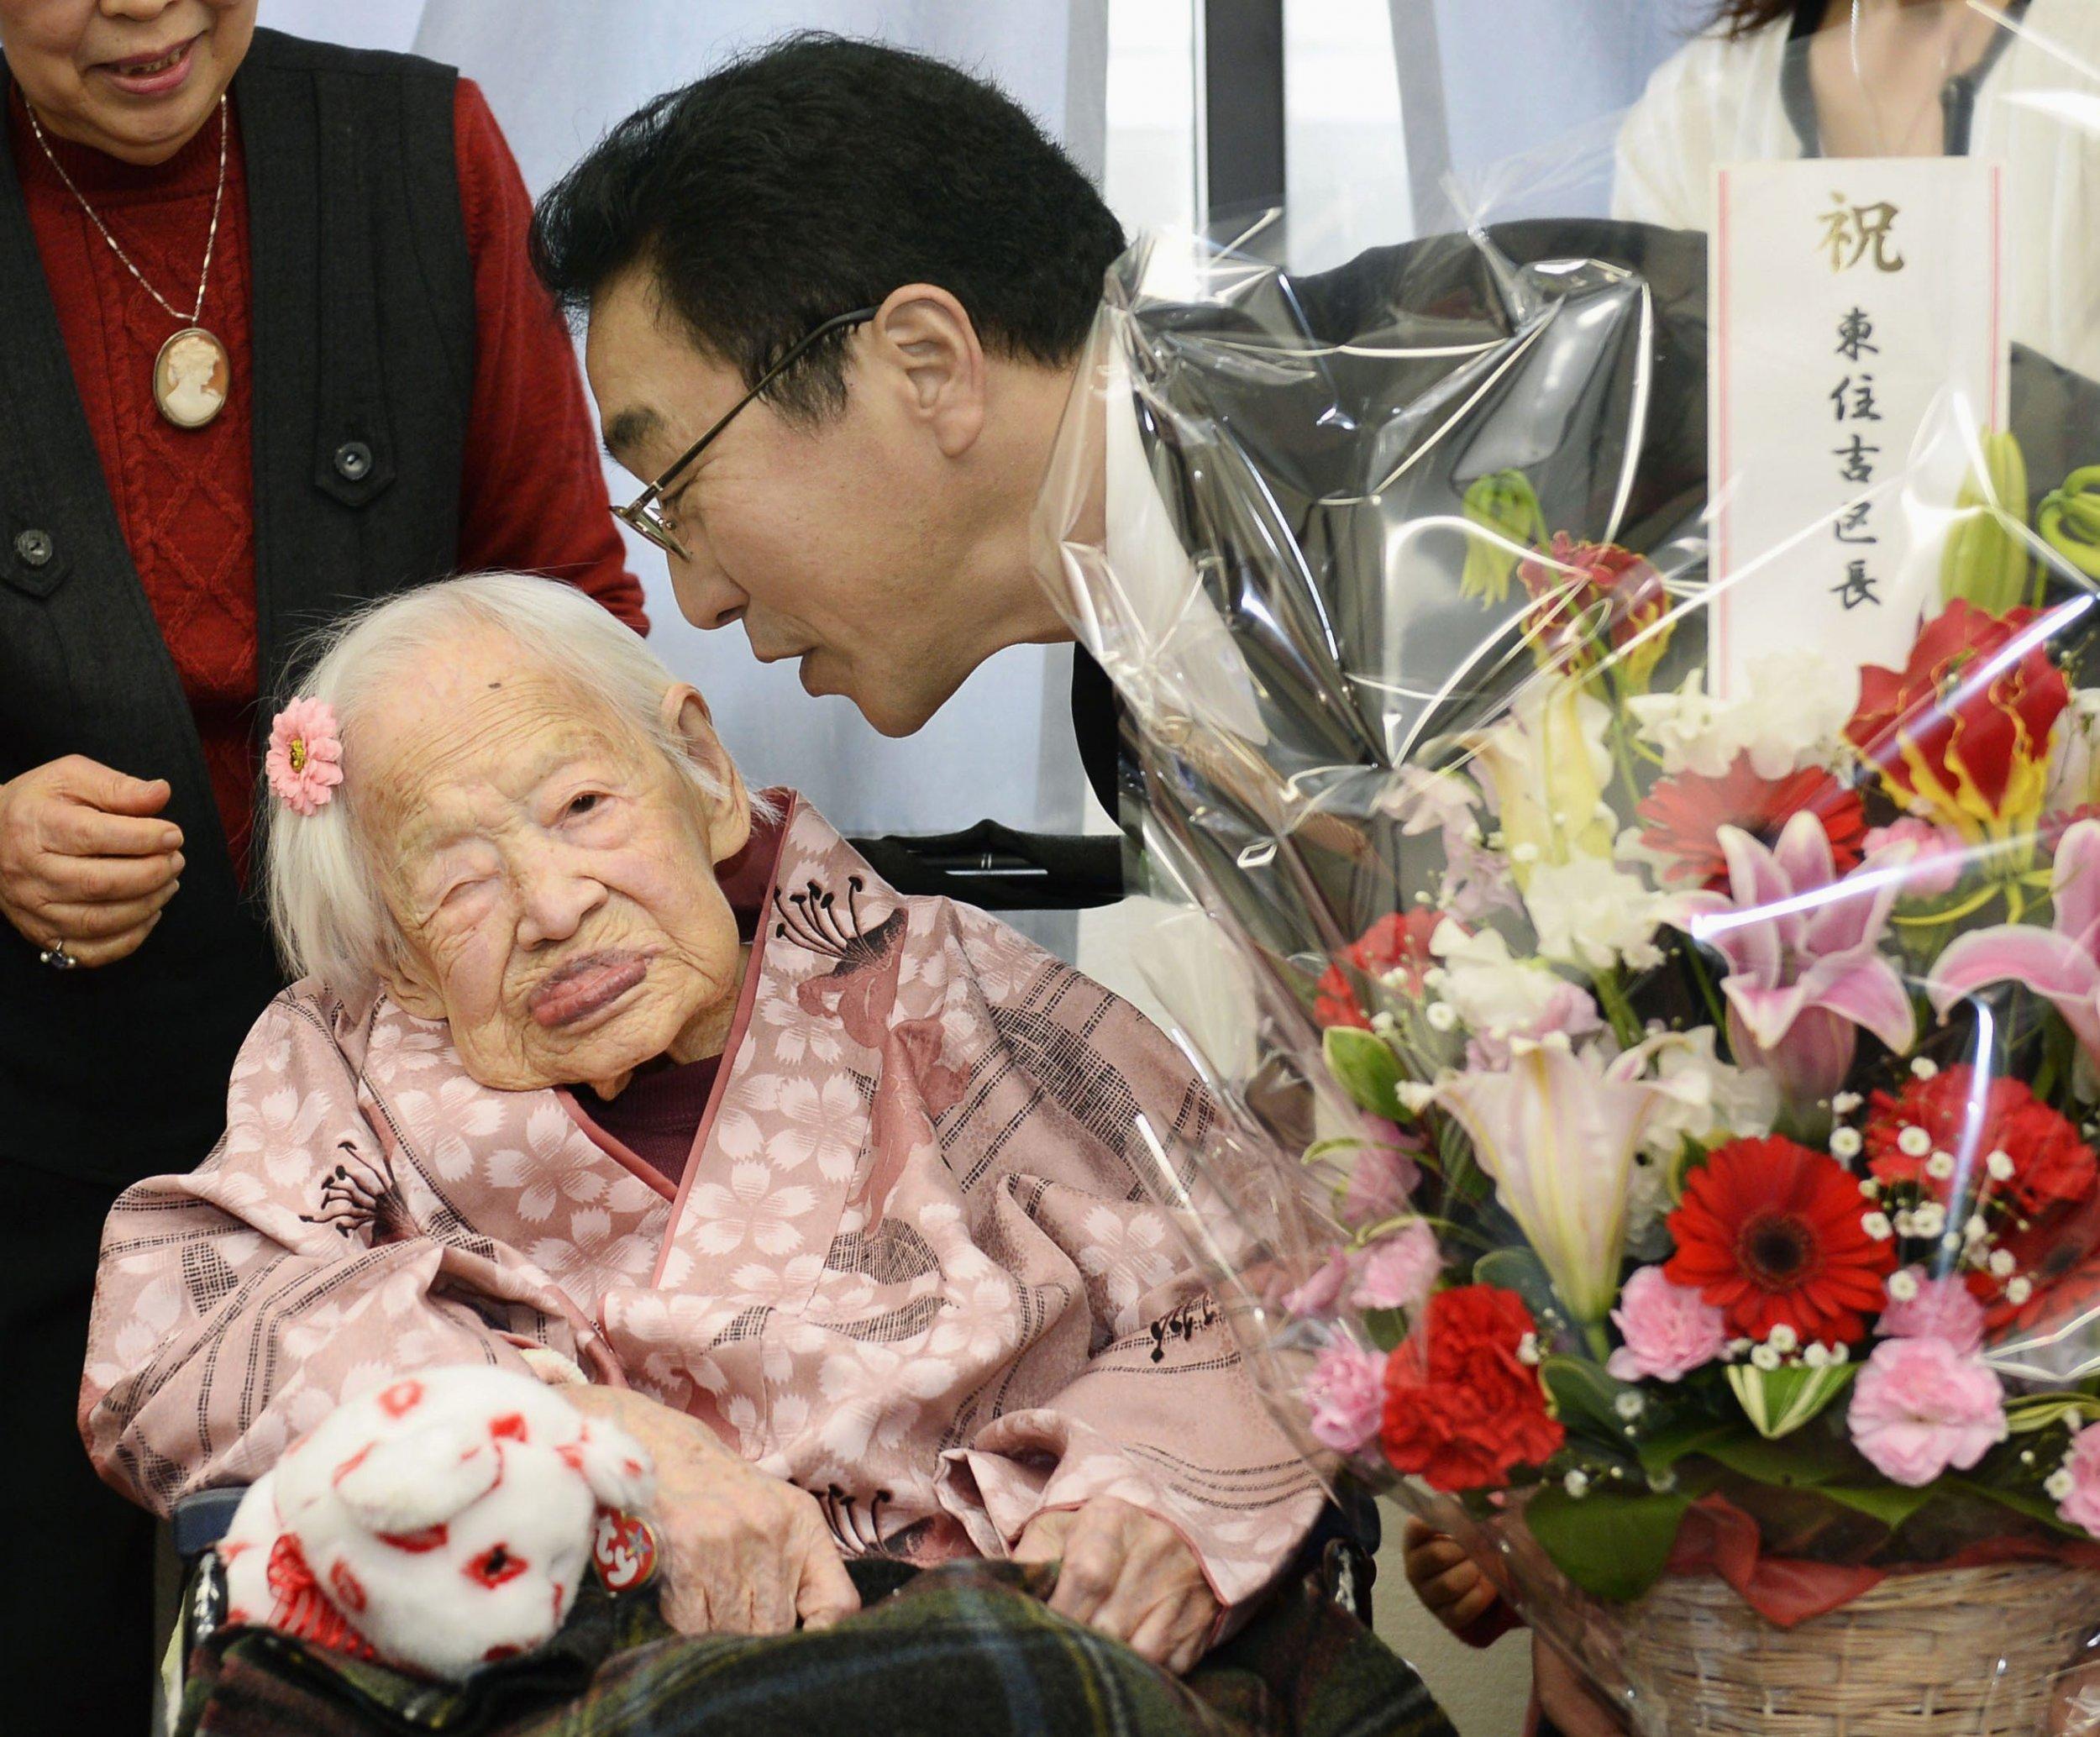 2015-03-05T034425Z_1327025453_GM1EB350W6W01_RTRMADP_3_JAPAN-OLDEST-WOMAN